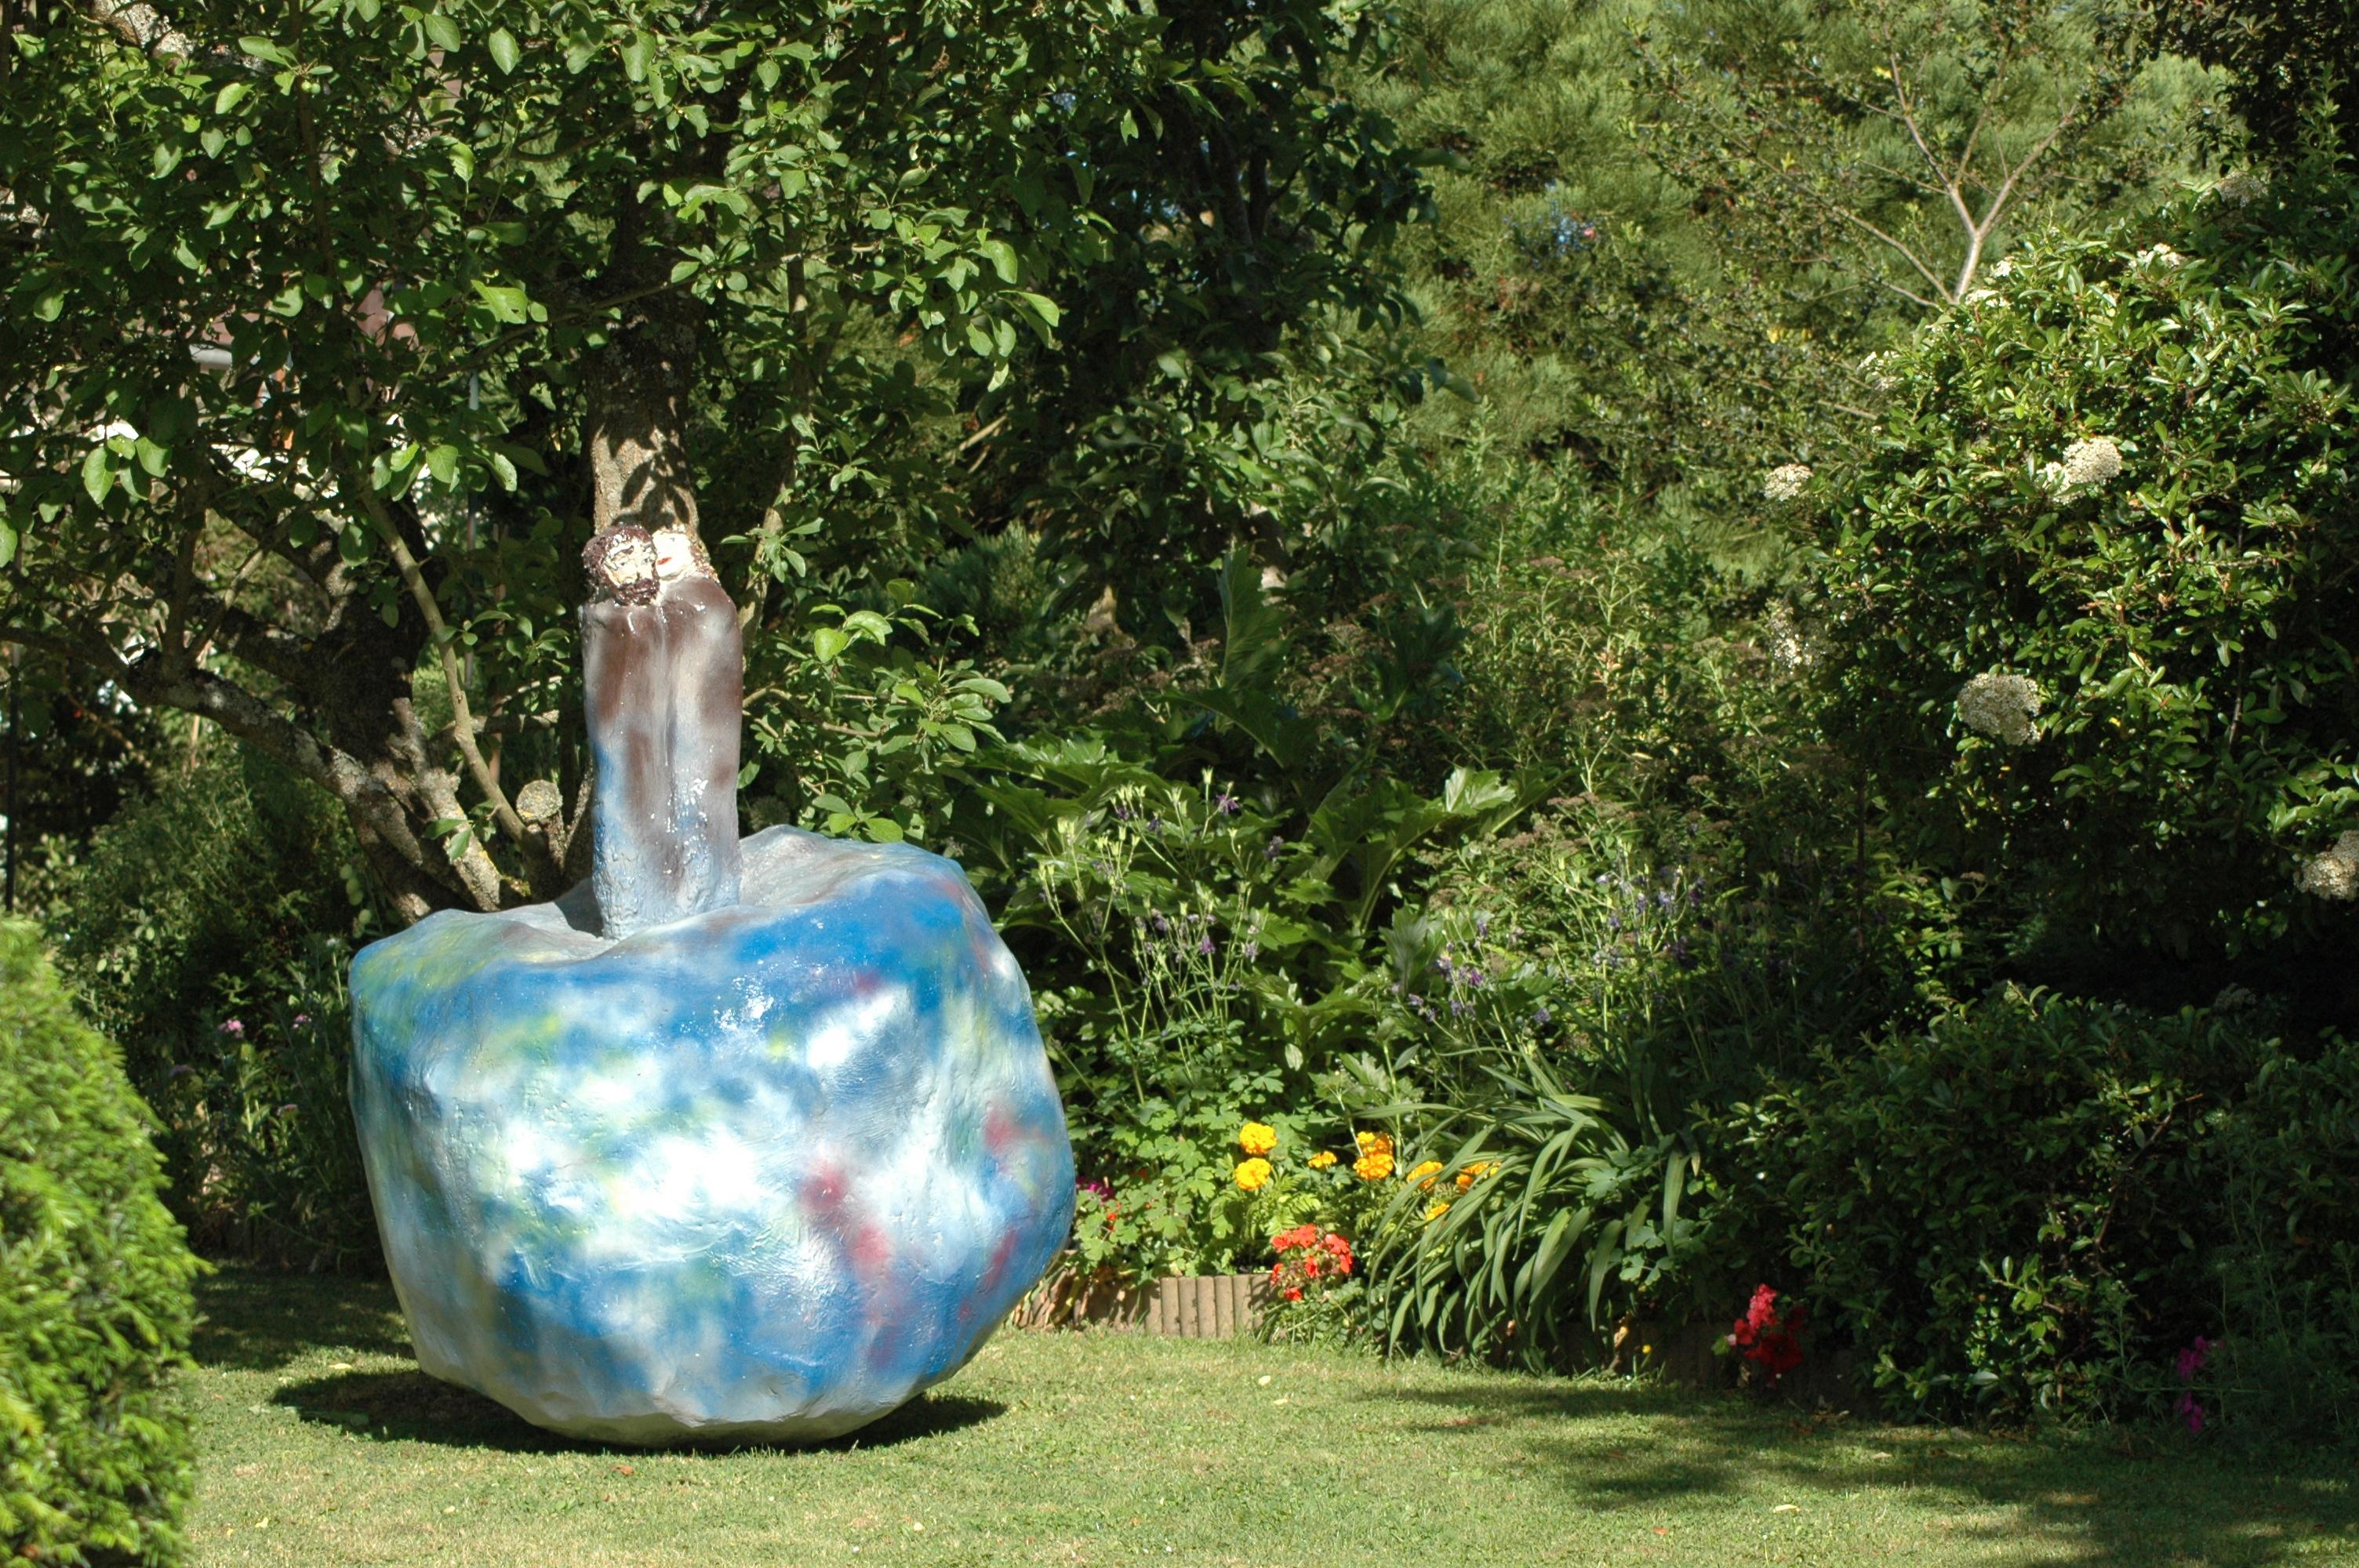 Le jardin des metamorphozes martine magritte for Jardin neurodon 2015